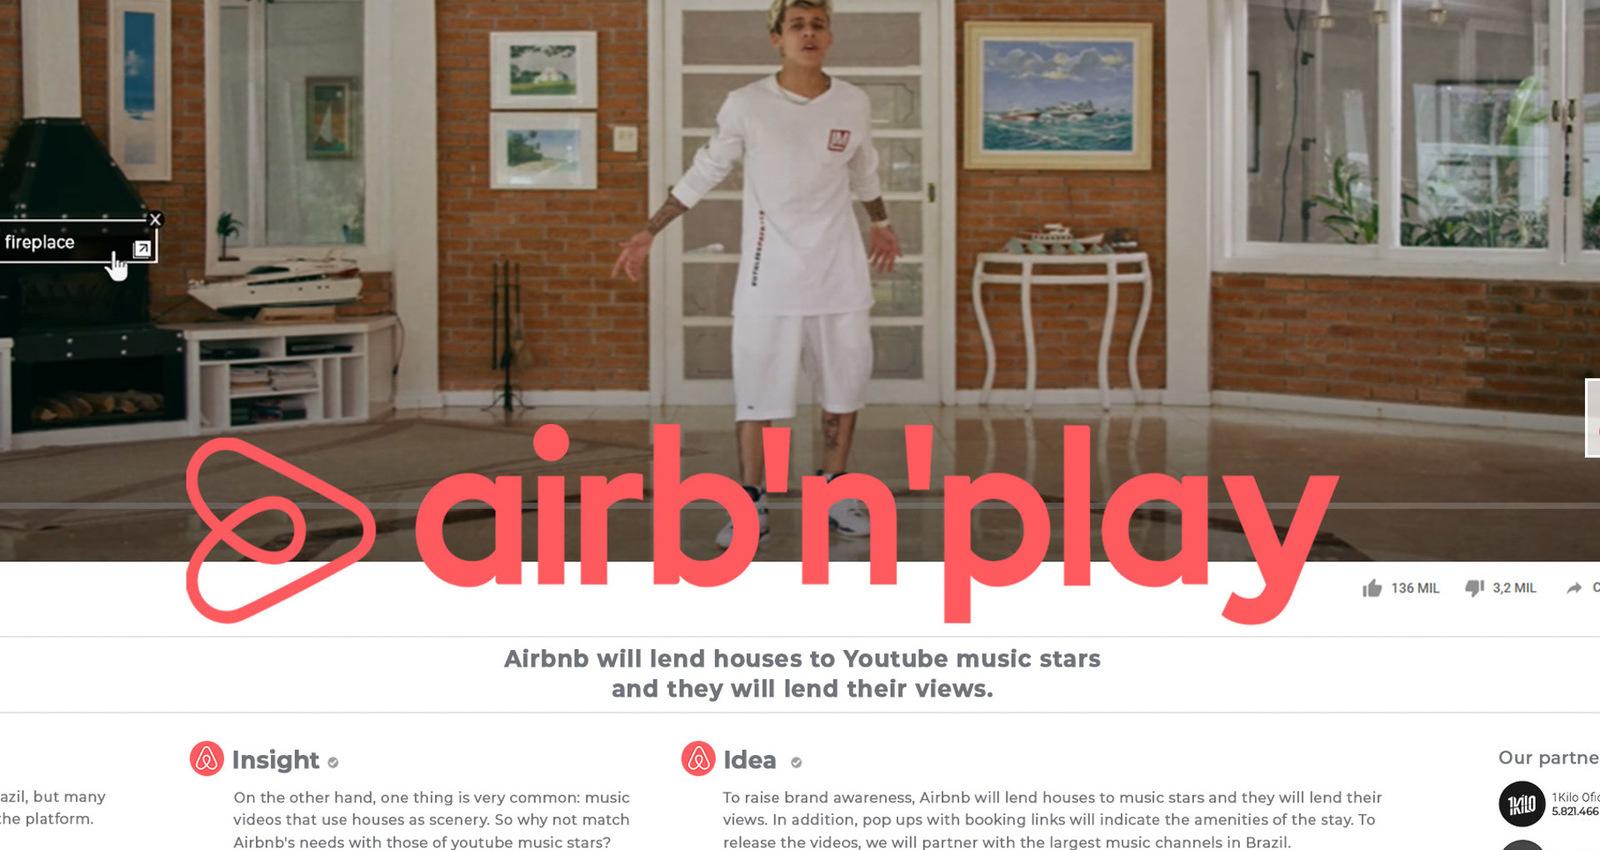 Airbnplay